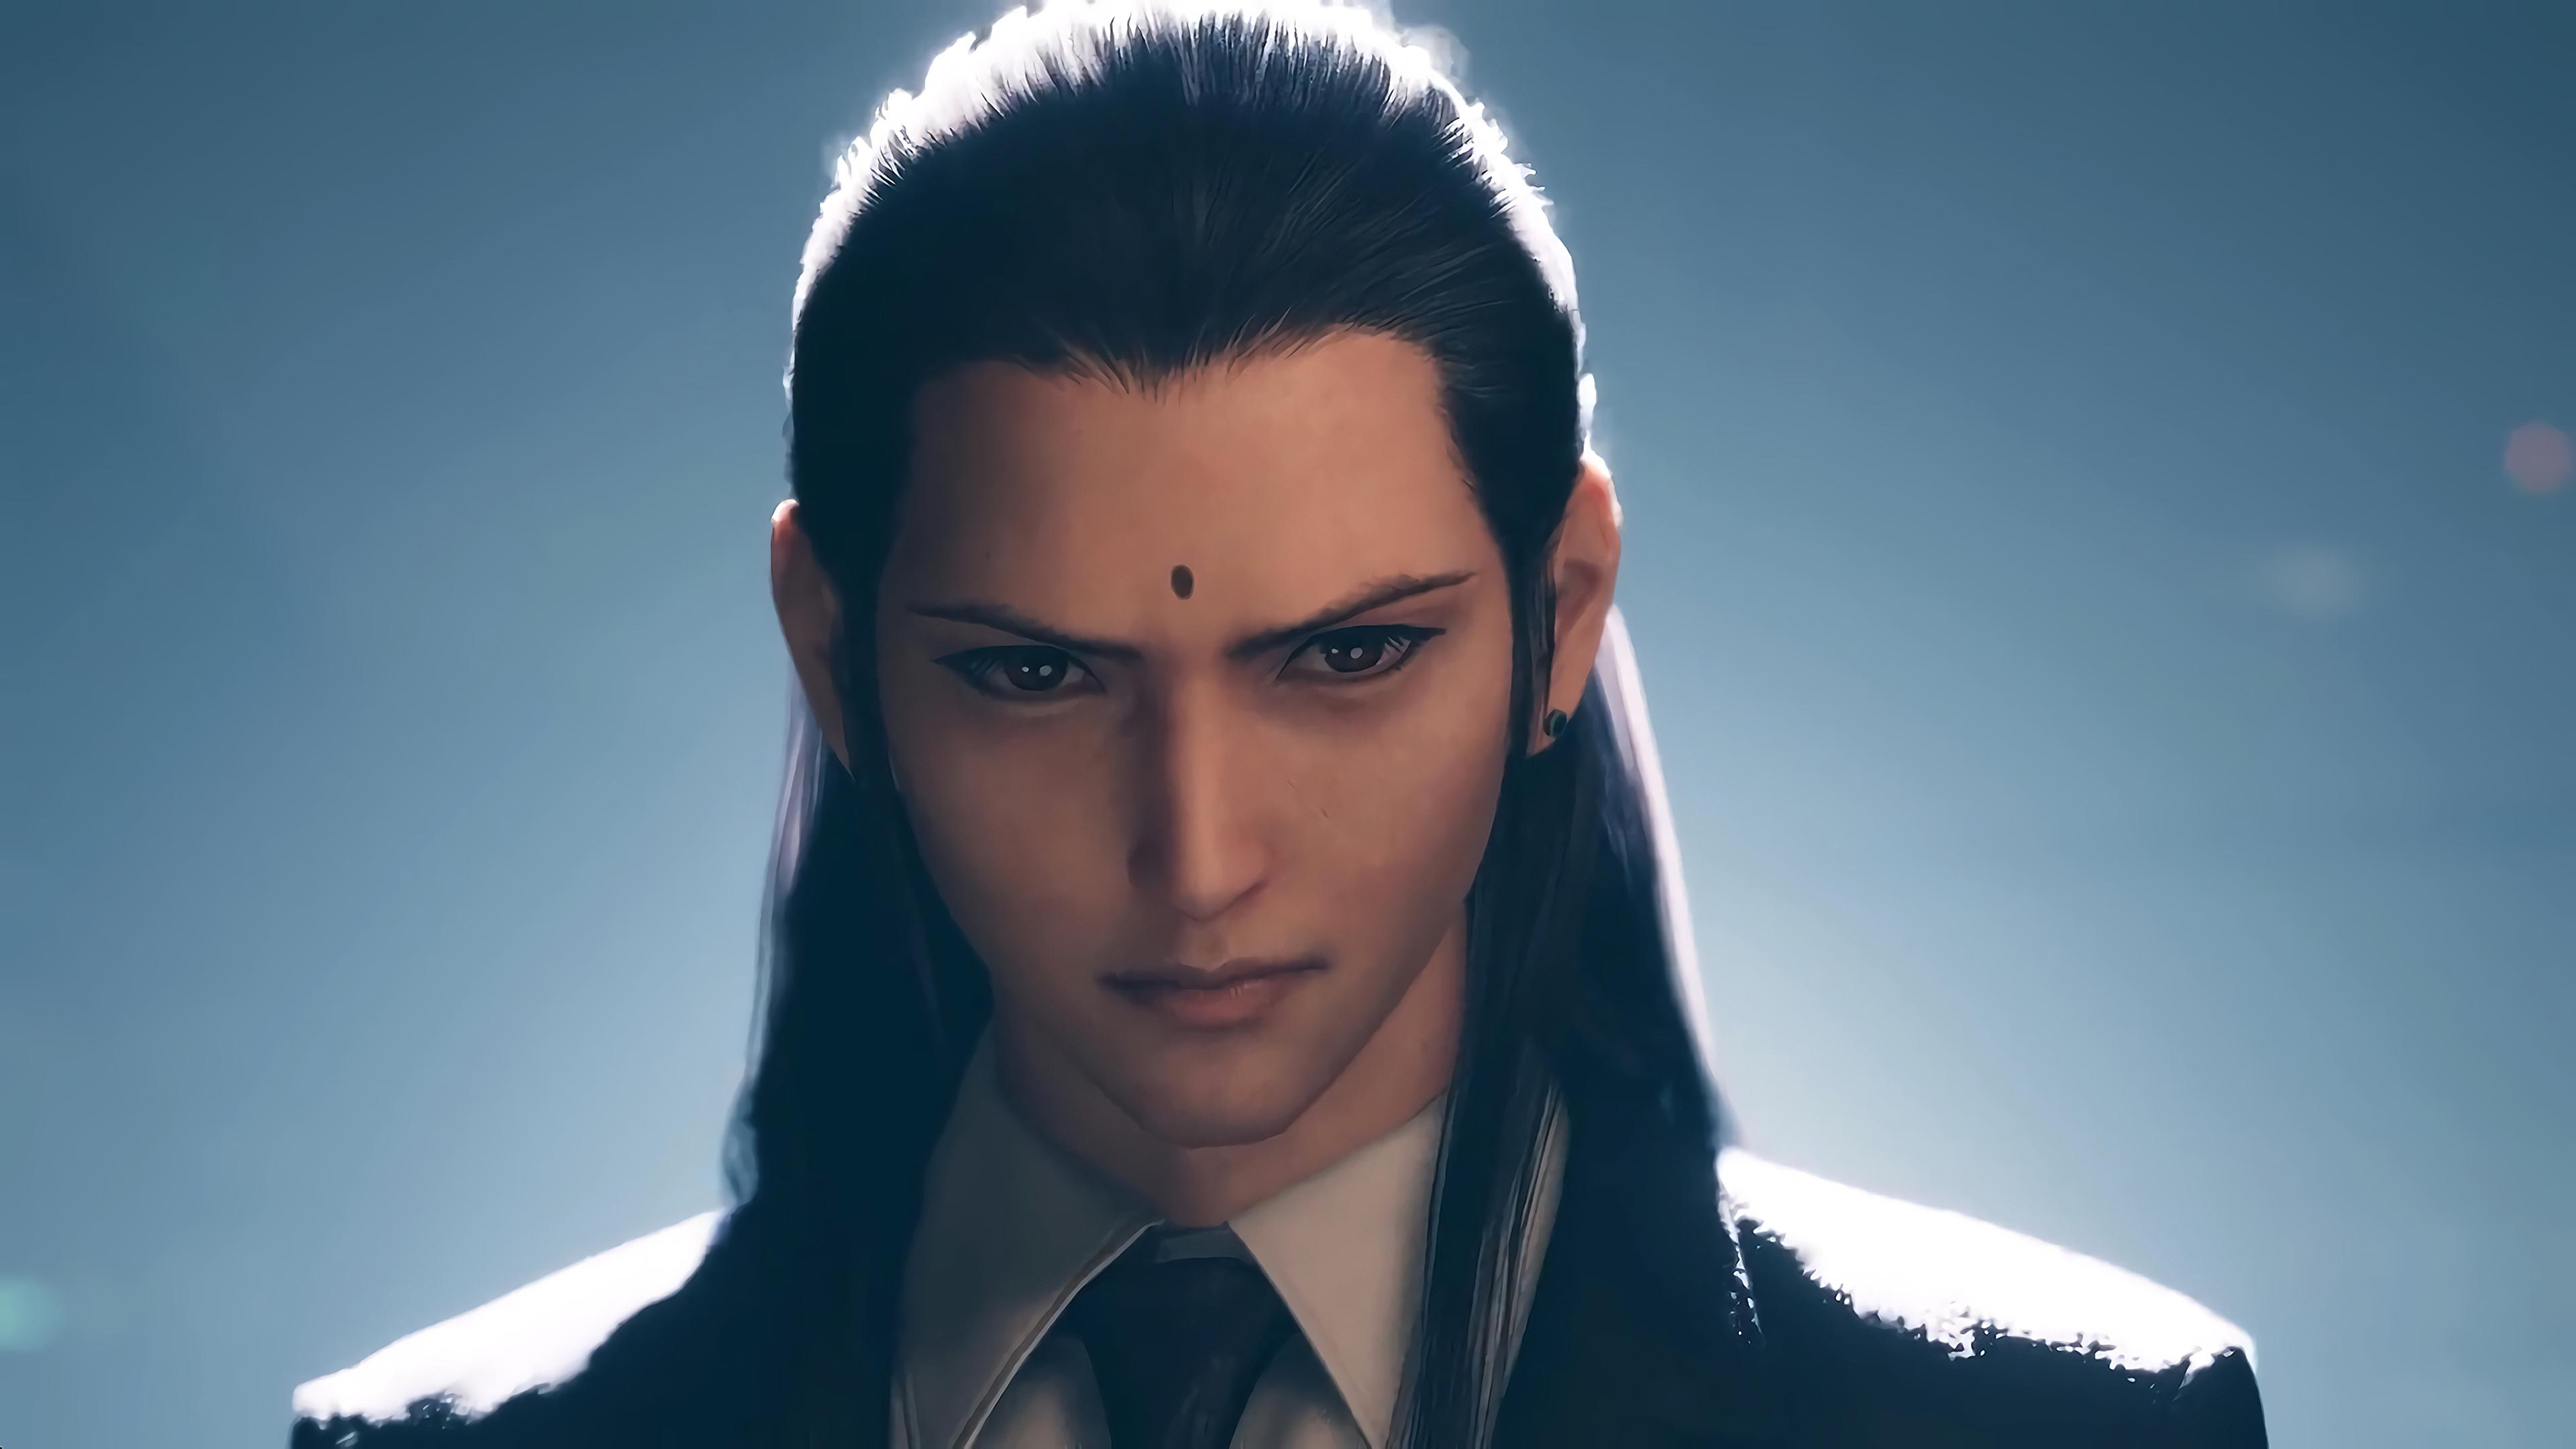 Tseng Final Fantasy 7 Remake Wallpaper, HD Games 4K ...